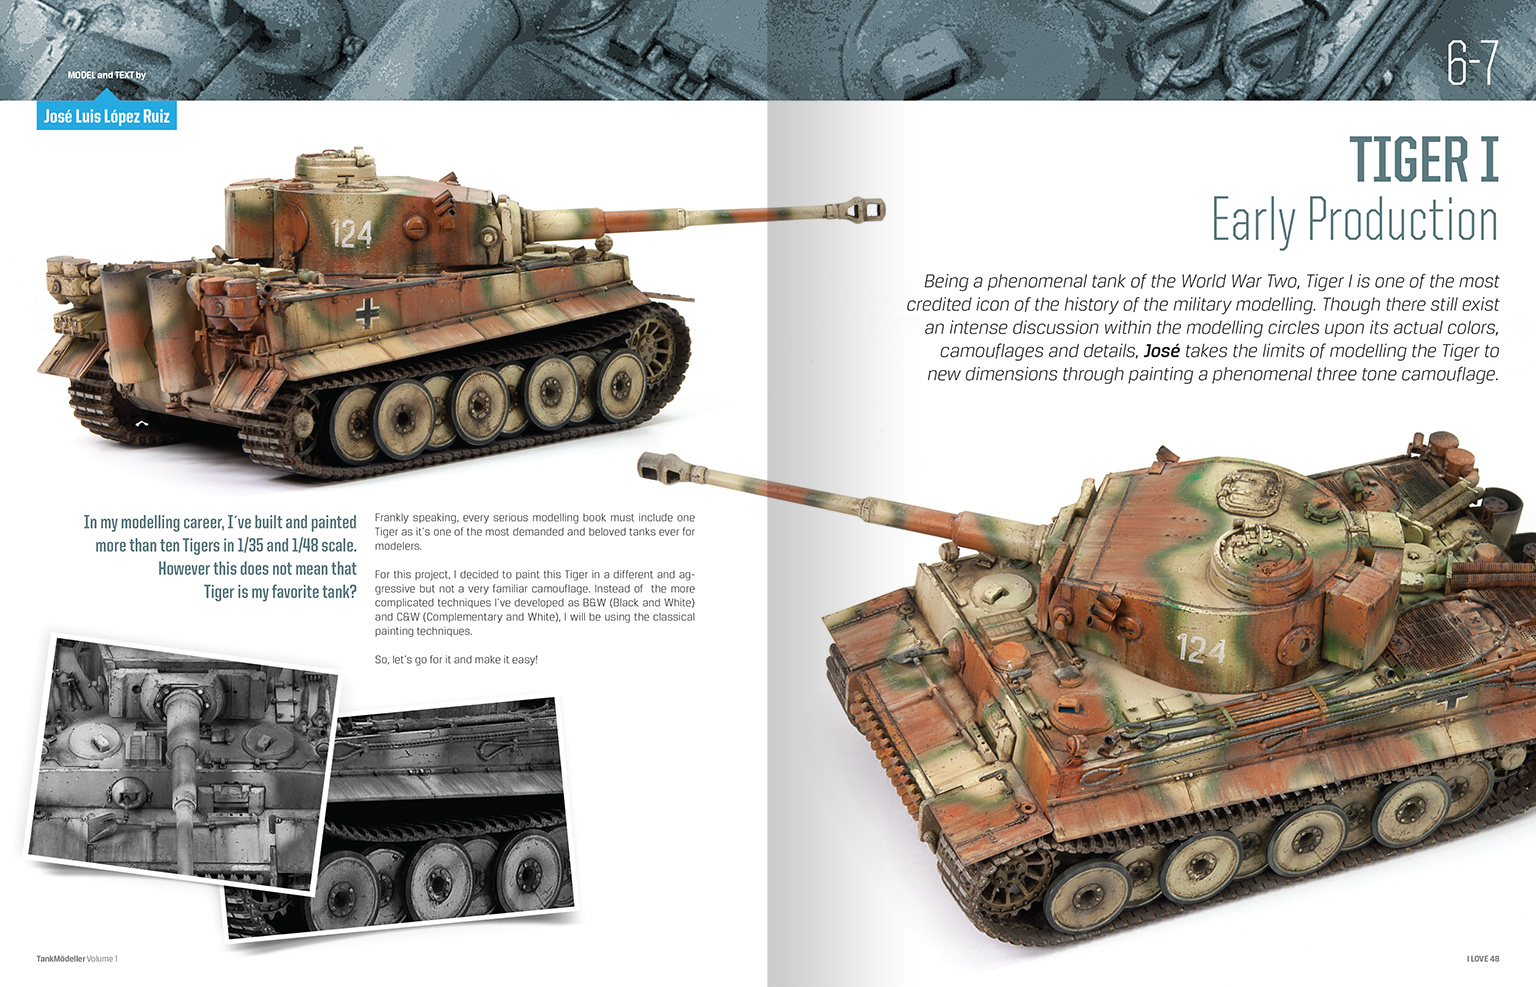 Kitap Dergi Puzzle Tank Modeller Modelling Books